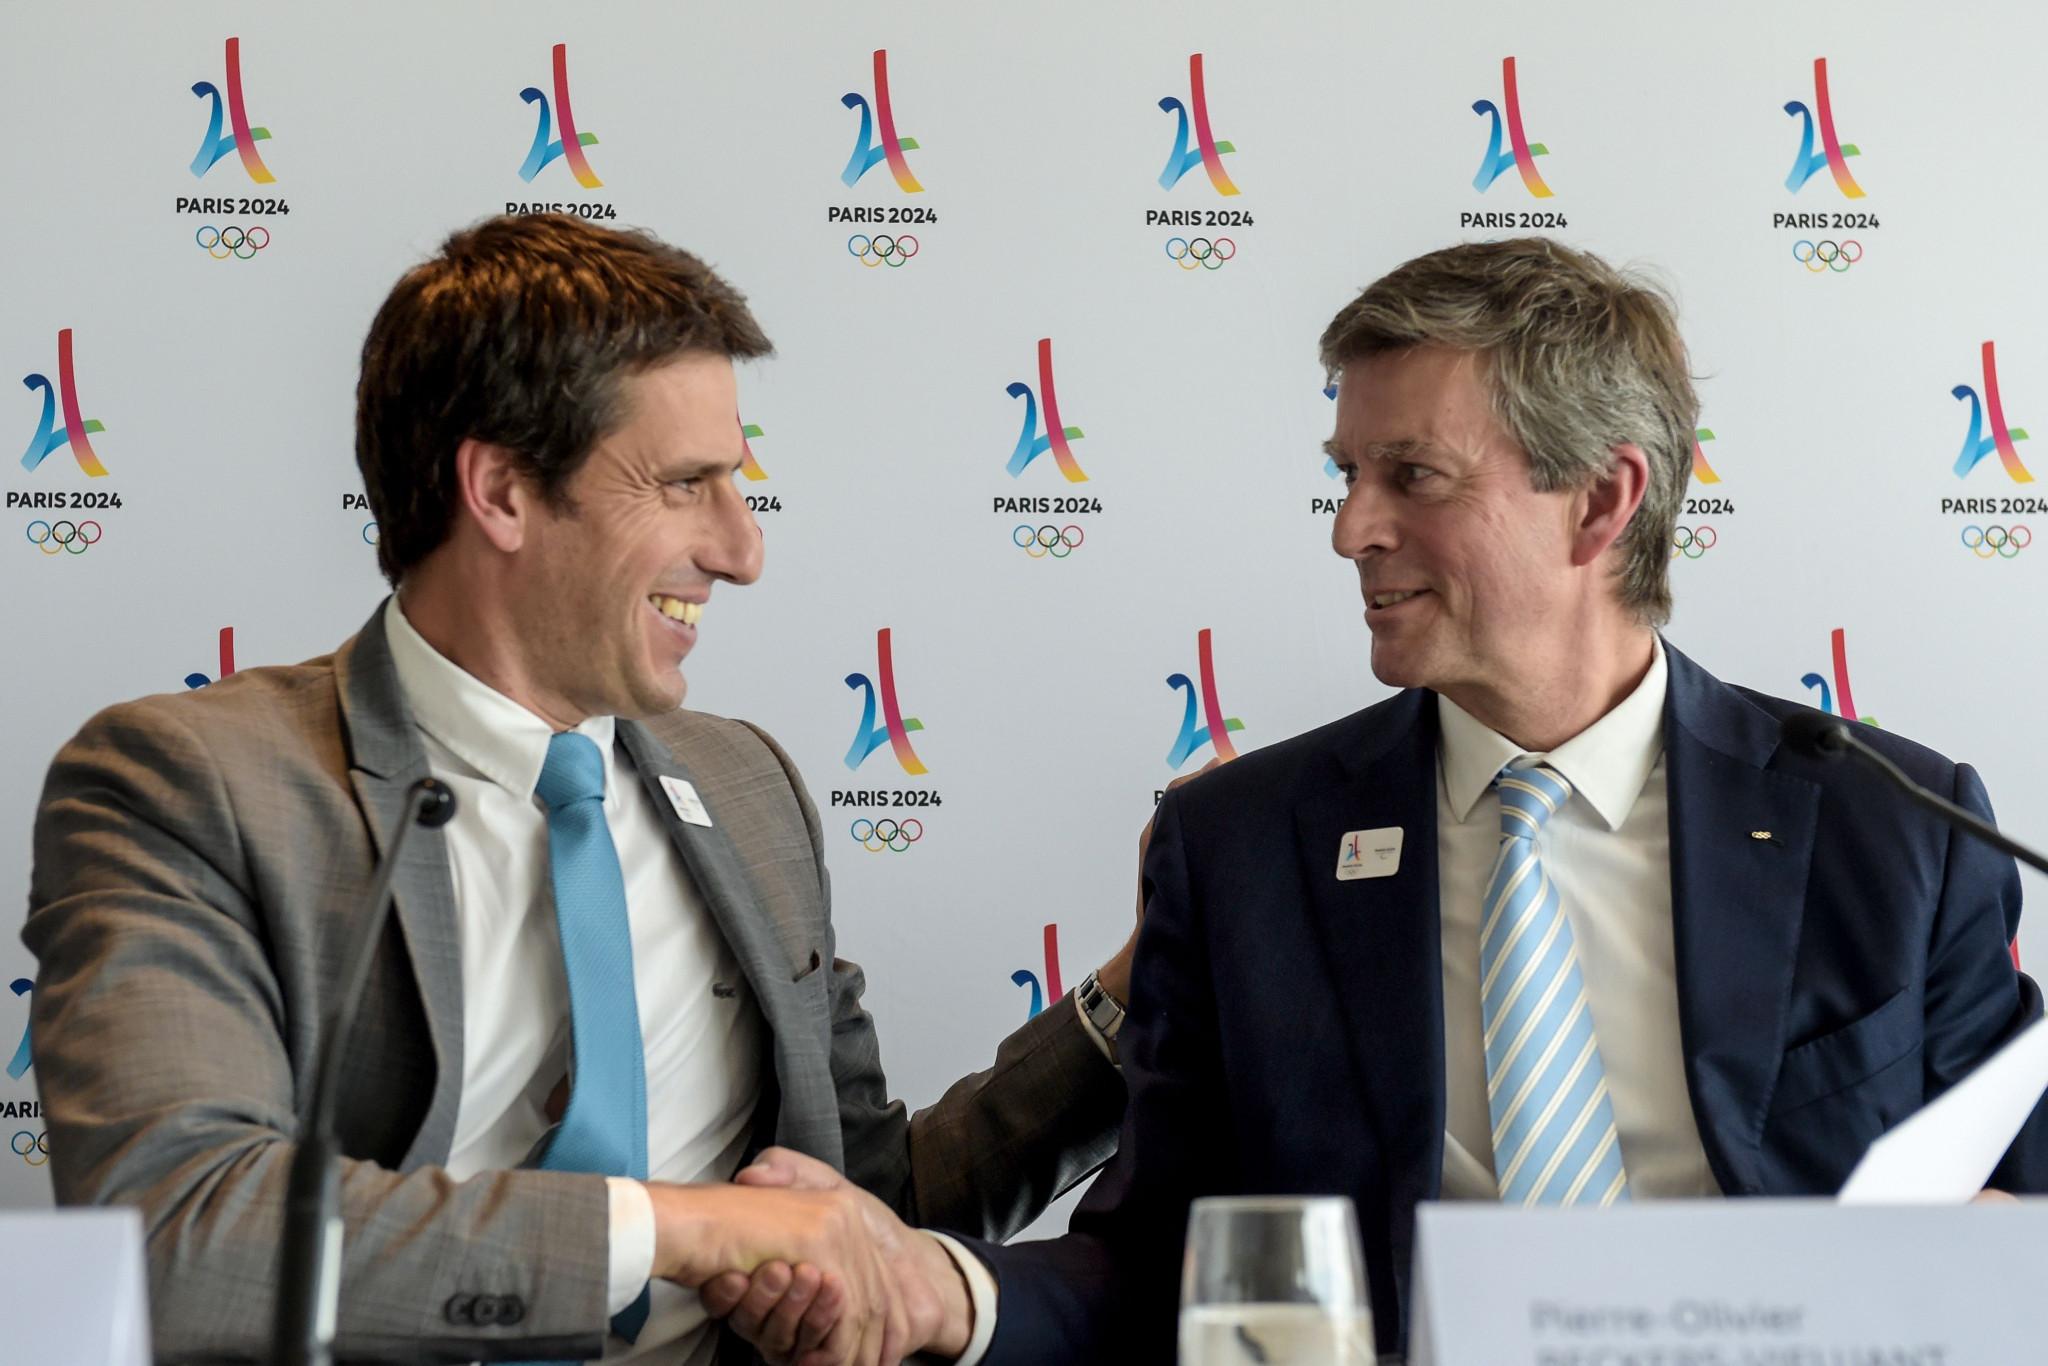 IOC Coordination Commission chairman describes high level of satisfaction over Paris 2024 progress